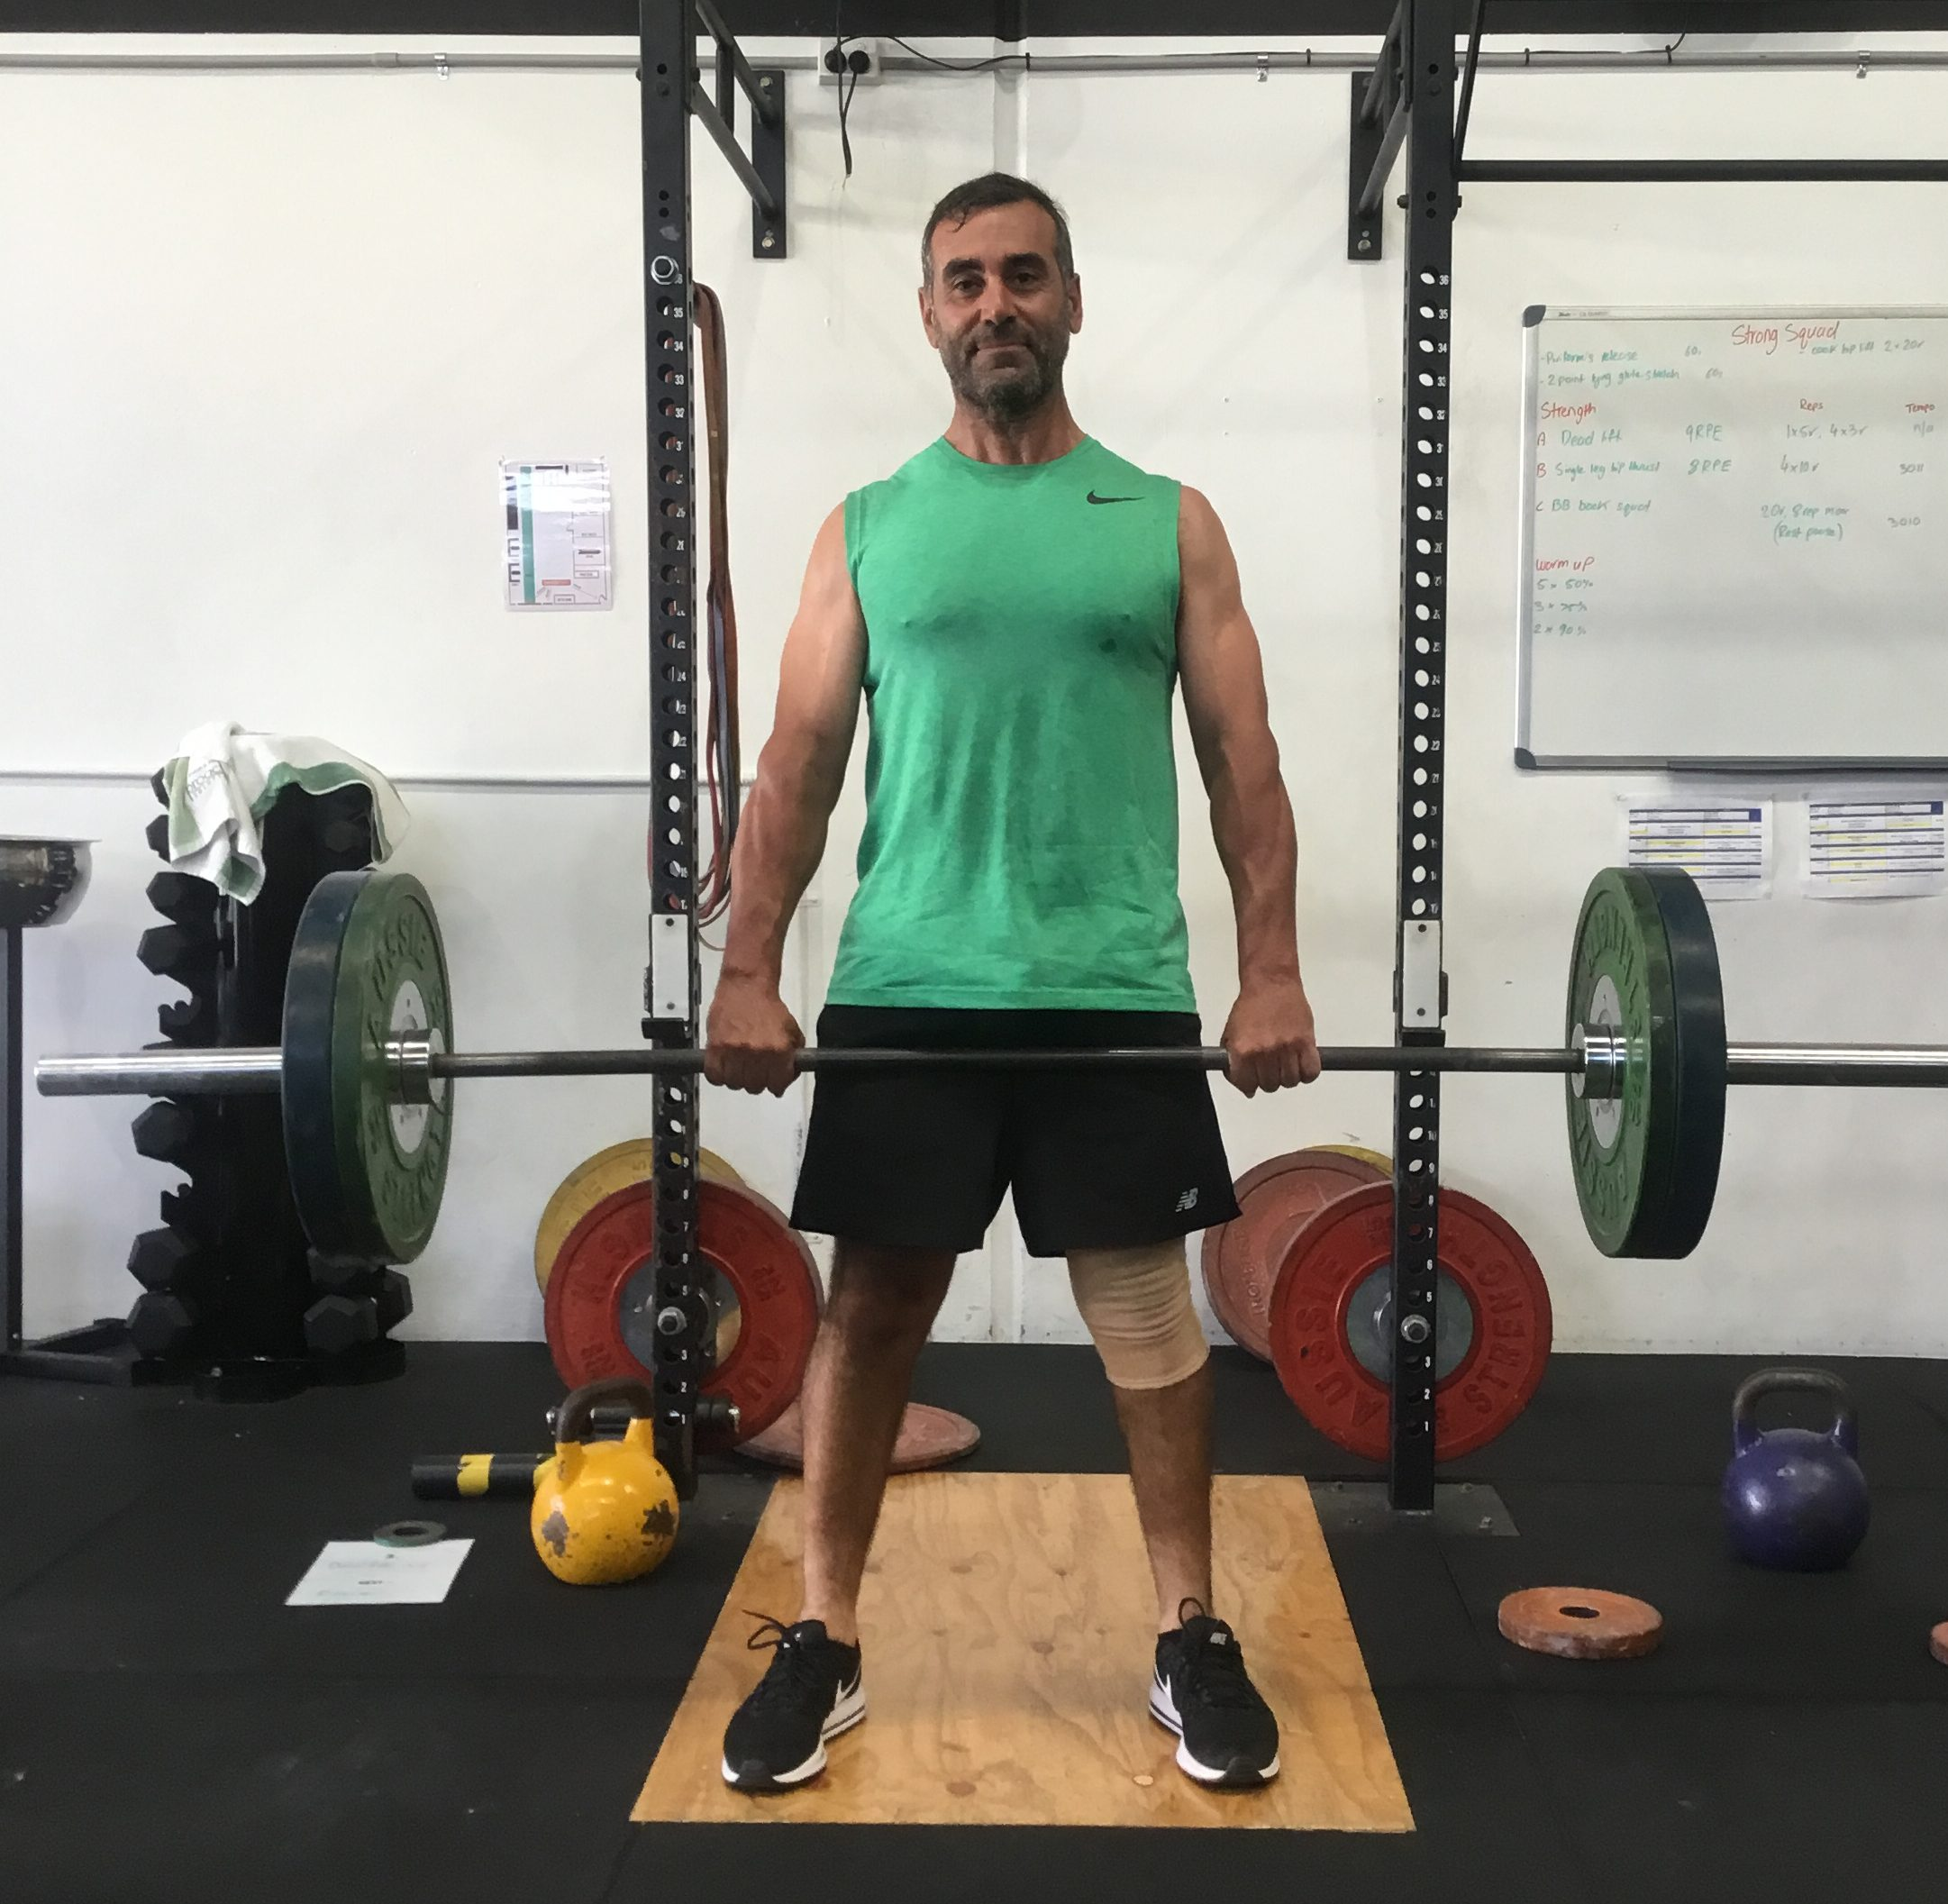 Weight training & fat loss